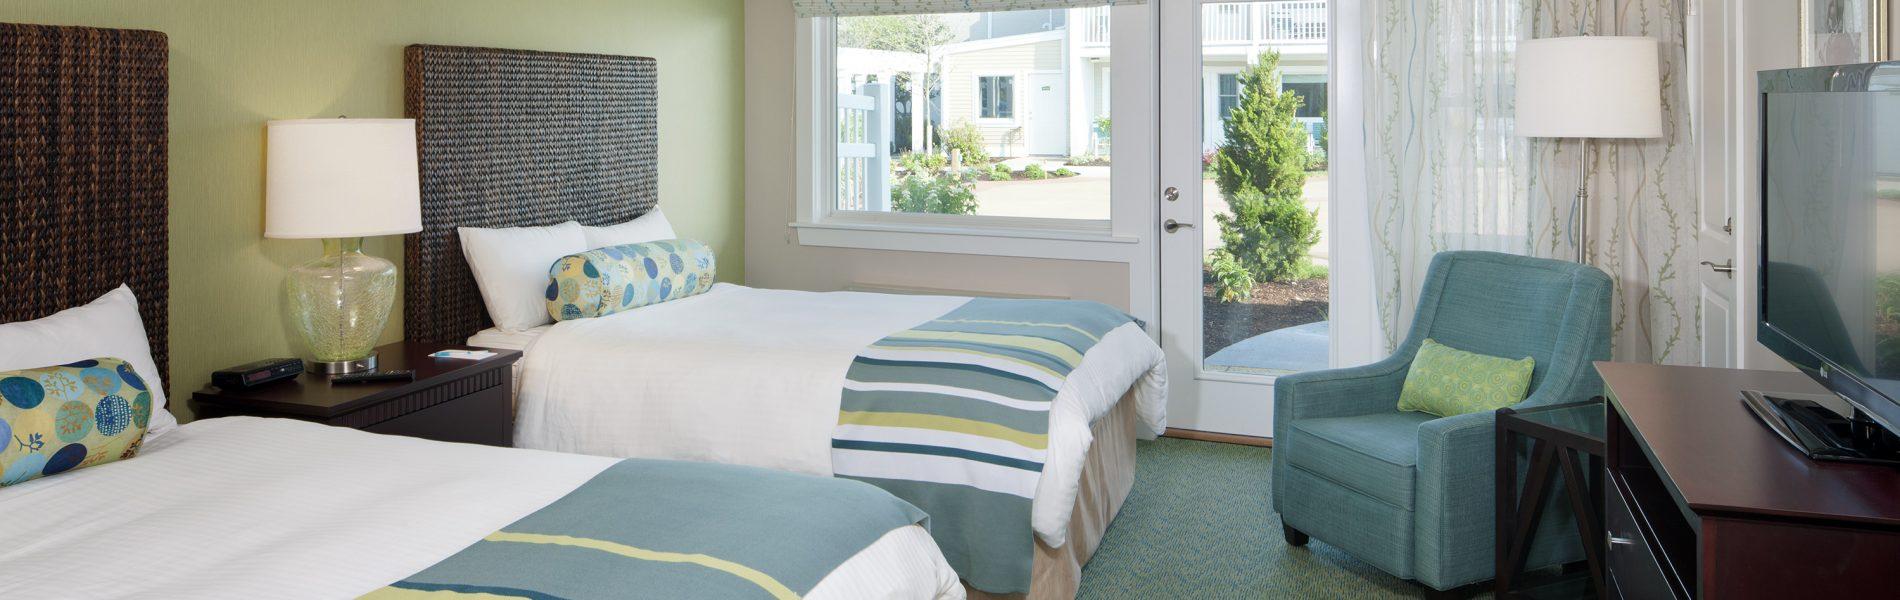 Falmouth Ma Lodging Accommodations Sea Crest Beach Hotel